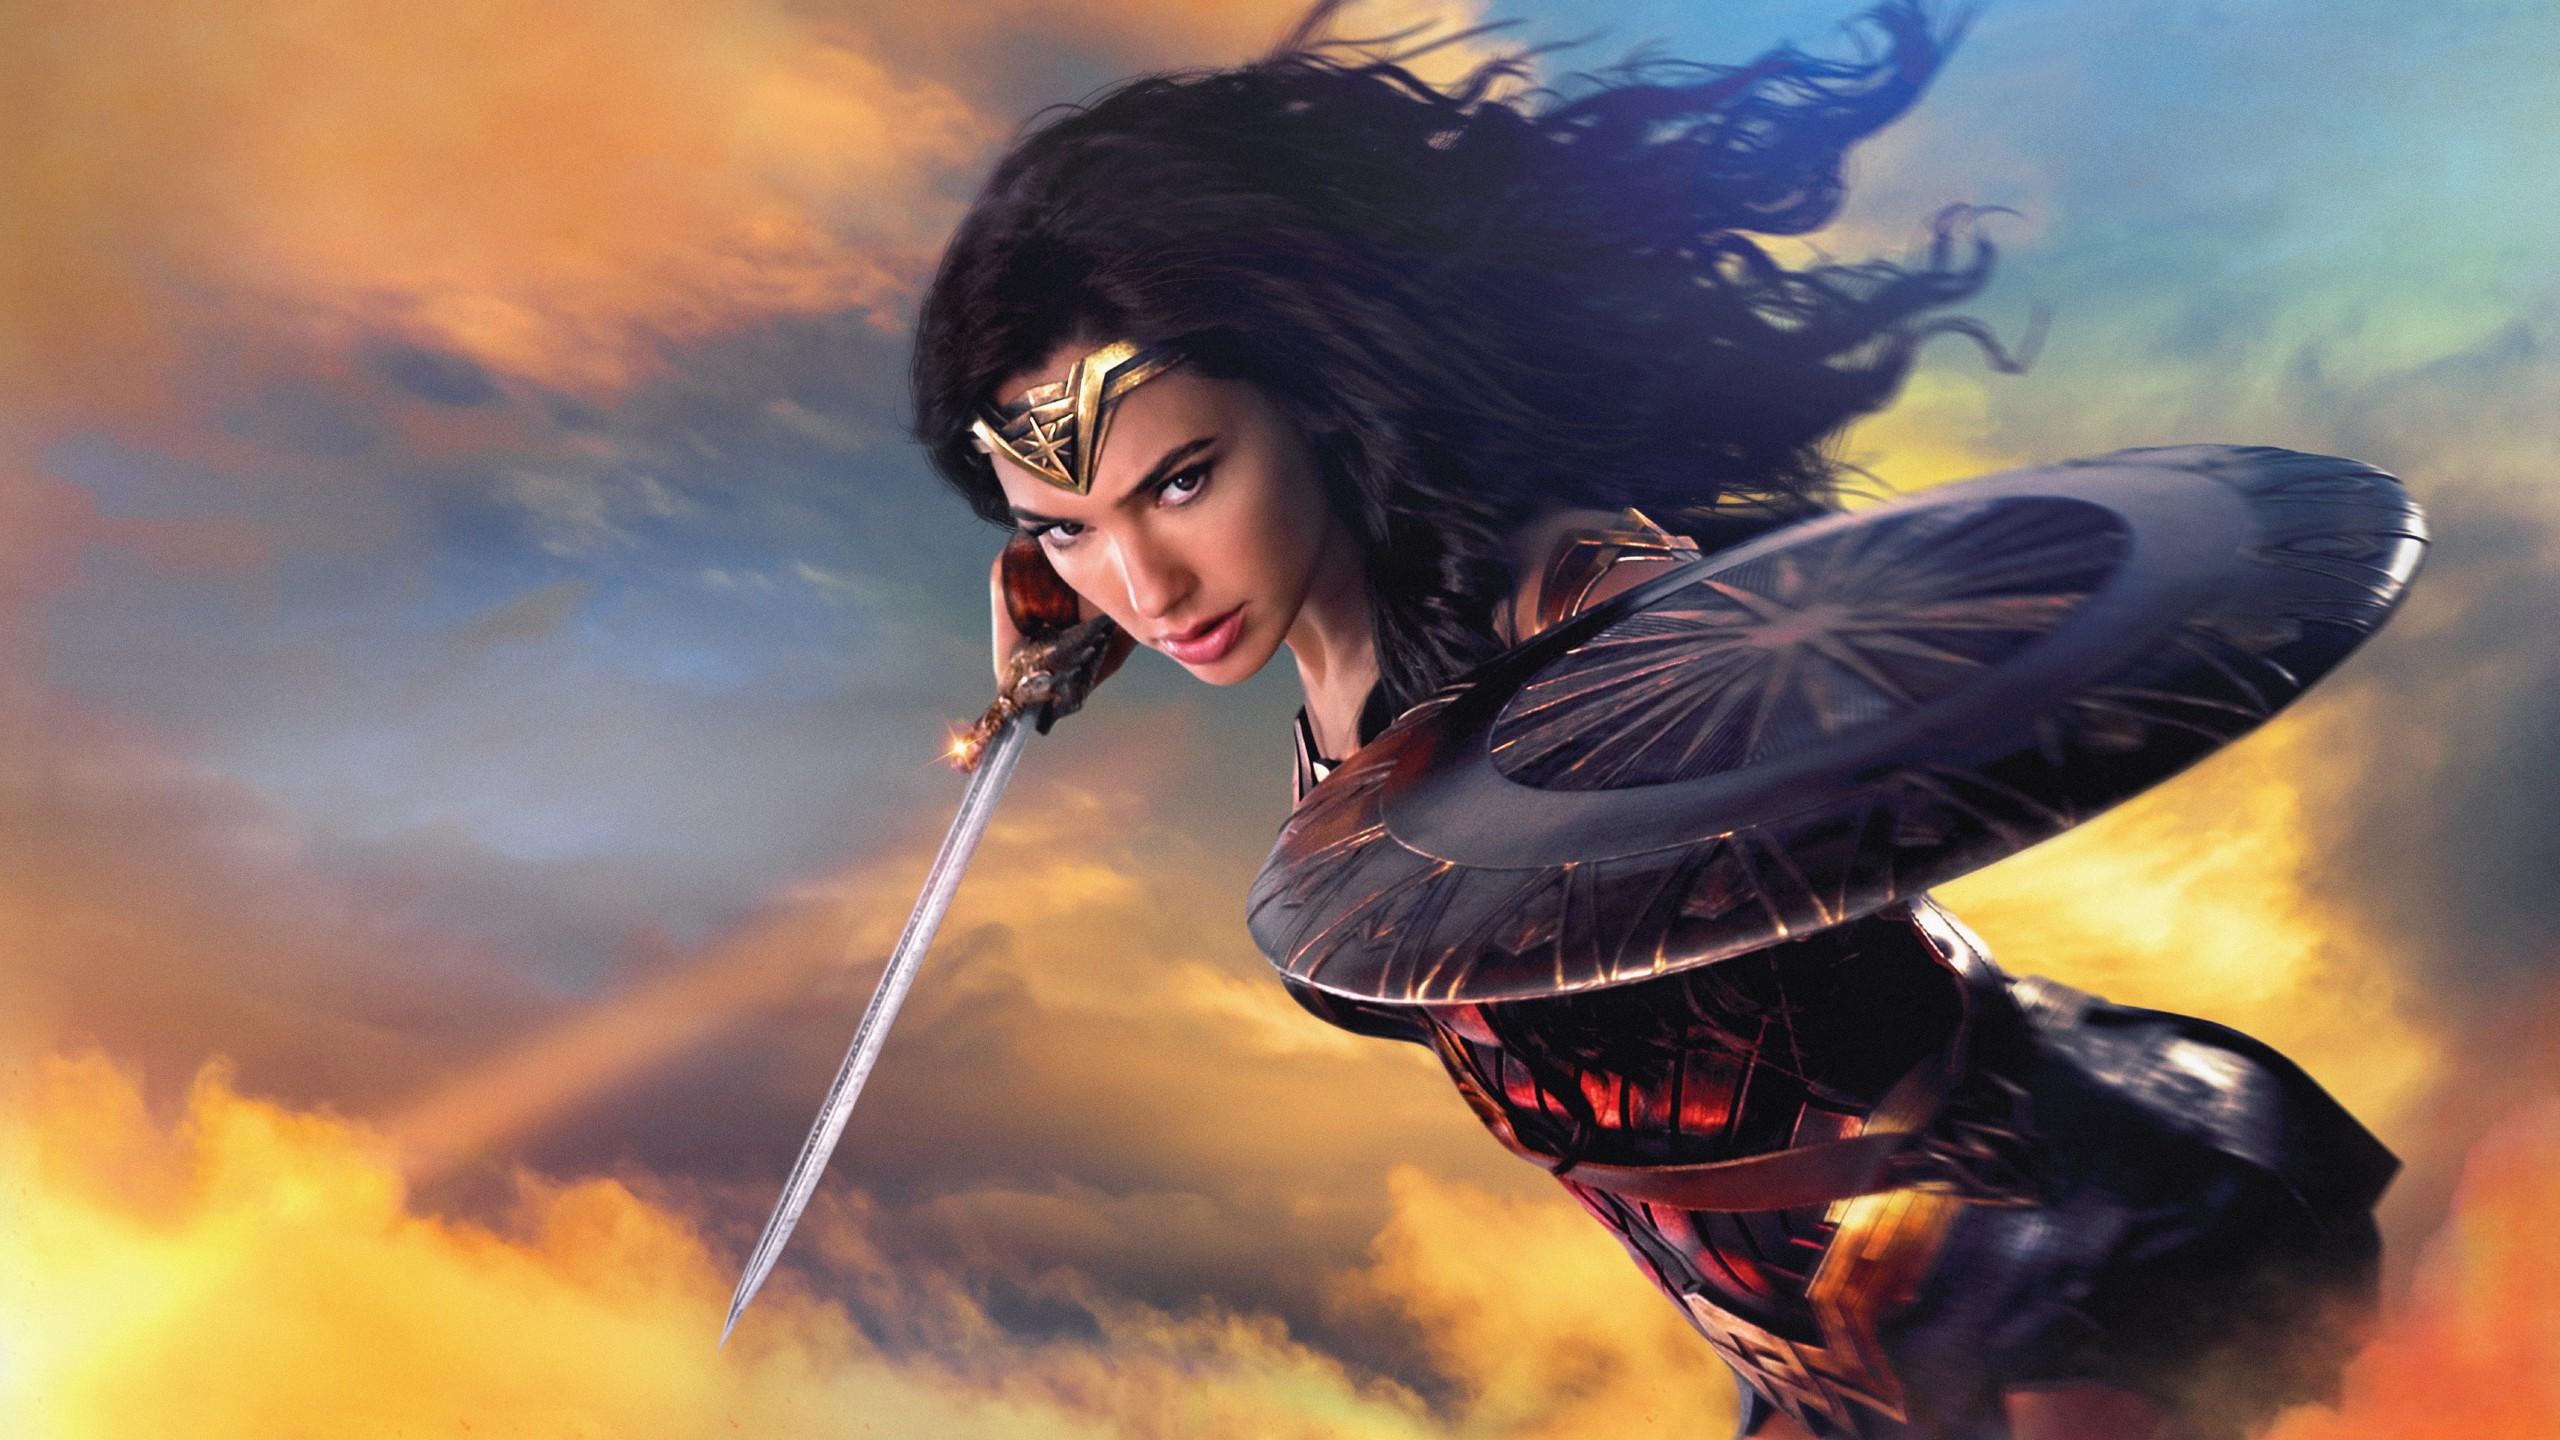 Lego Wallpaper Iphone X Wonder Woman 4k 8k Movie Wallpapers Hd Wallpapers Id